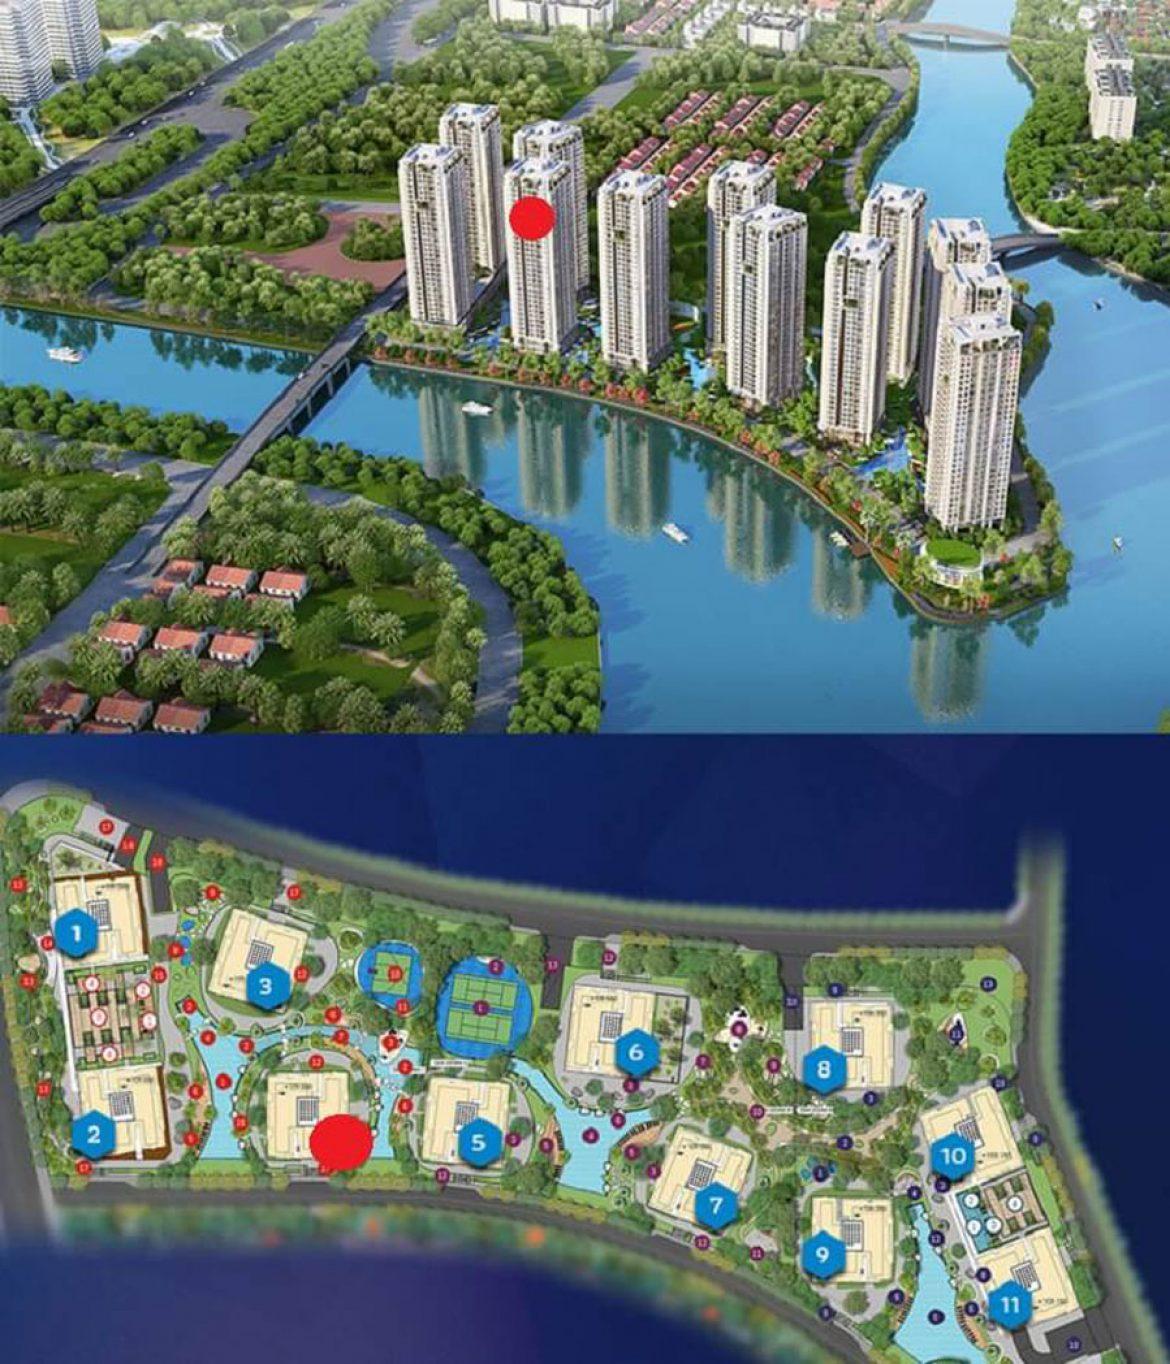 Location block 4 (circle orange) Ruby Riverside subdivision, project Gem Riverside District 2